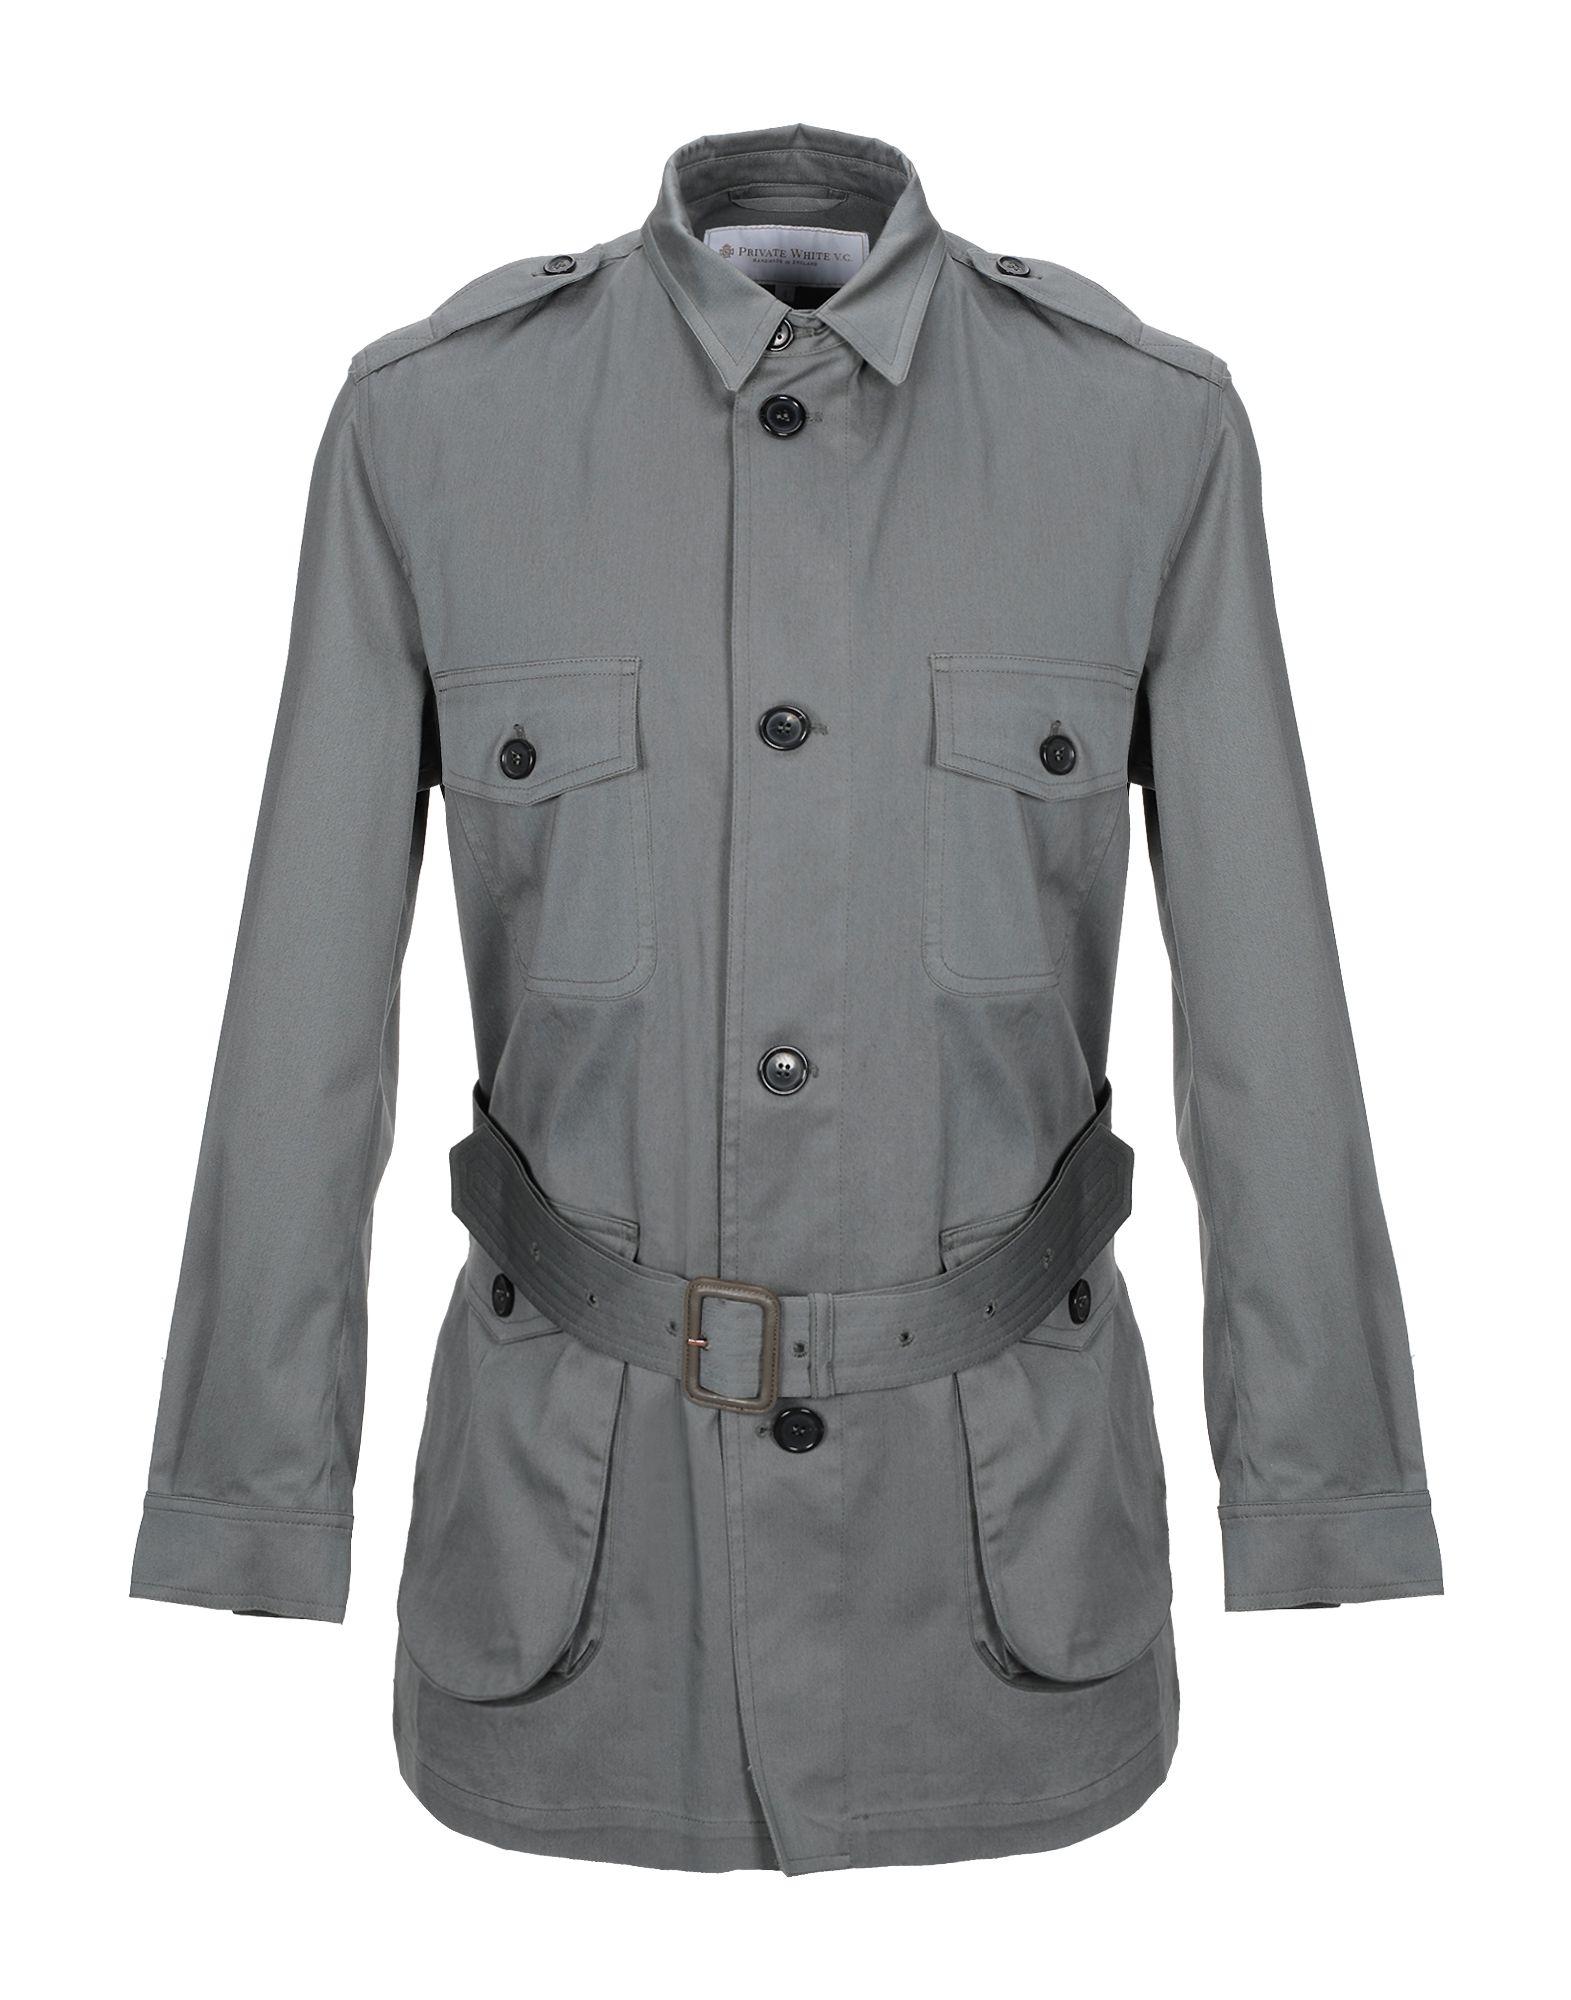 Фото - PRIVATE WHITE V.C. Легкое пальто nous etudions легкое пальто